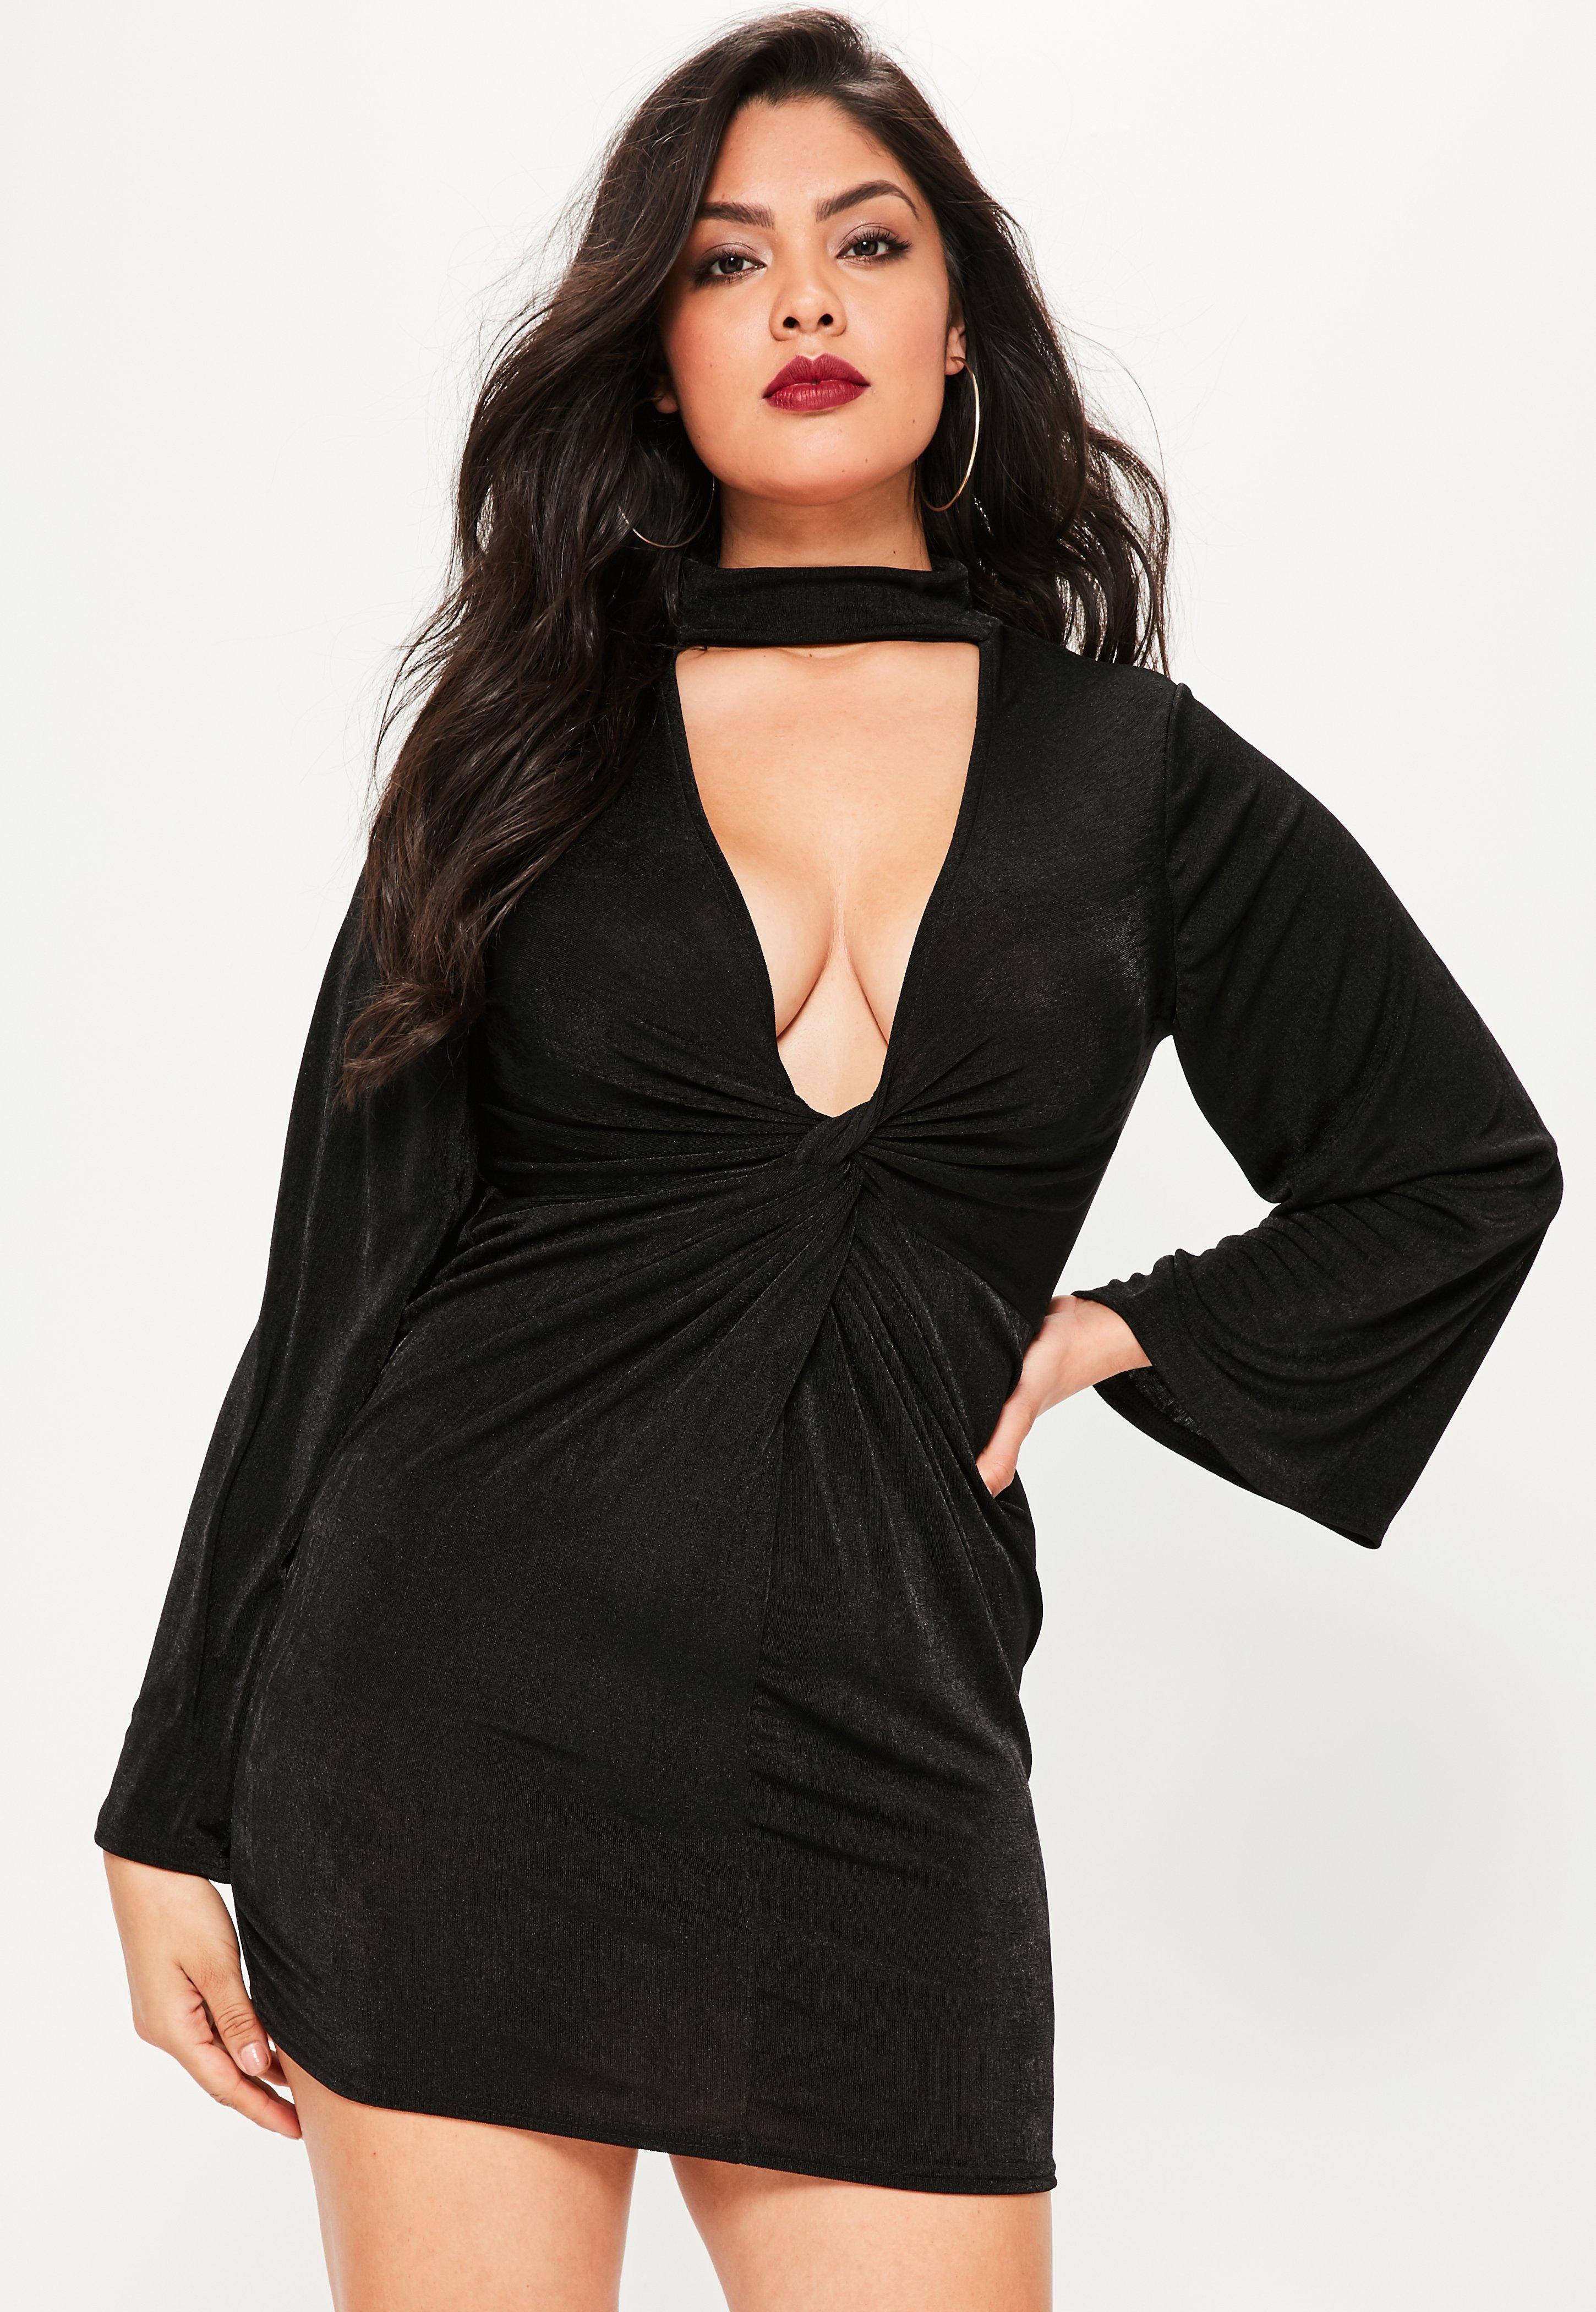 Plus Size Black Choker Neck Slinky Mini Dress| Missguided